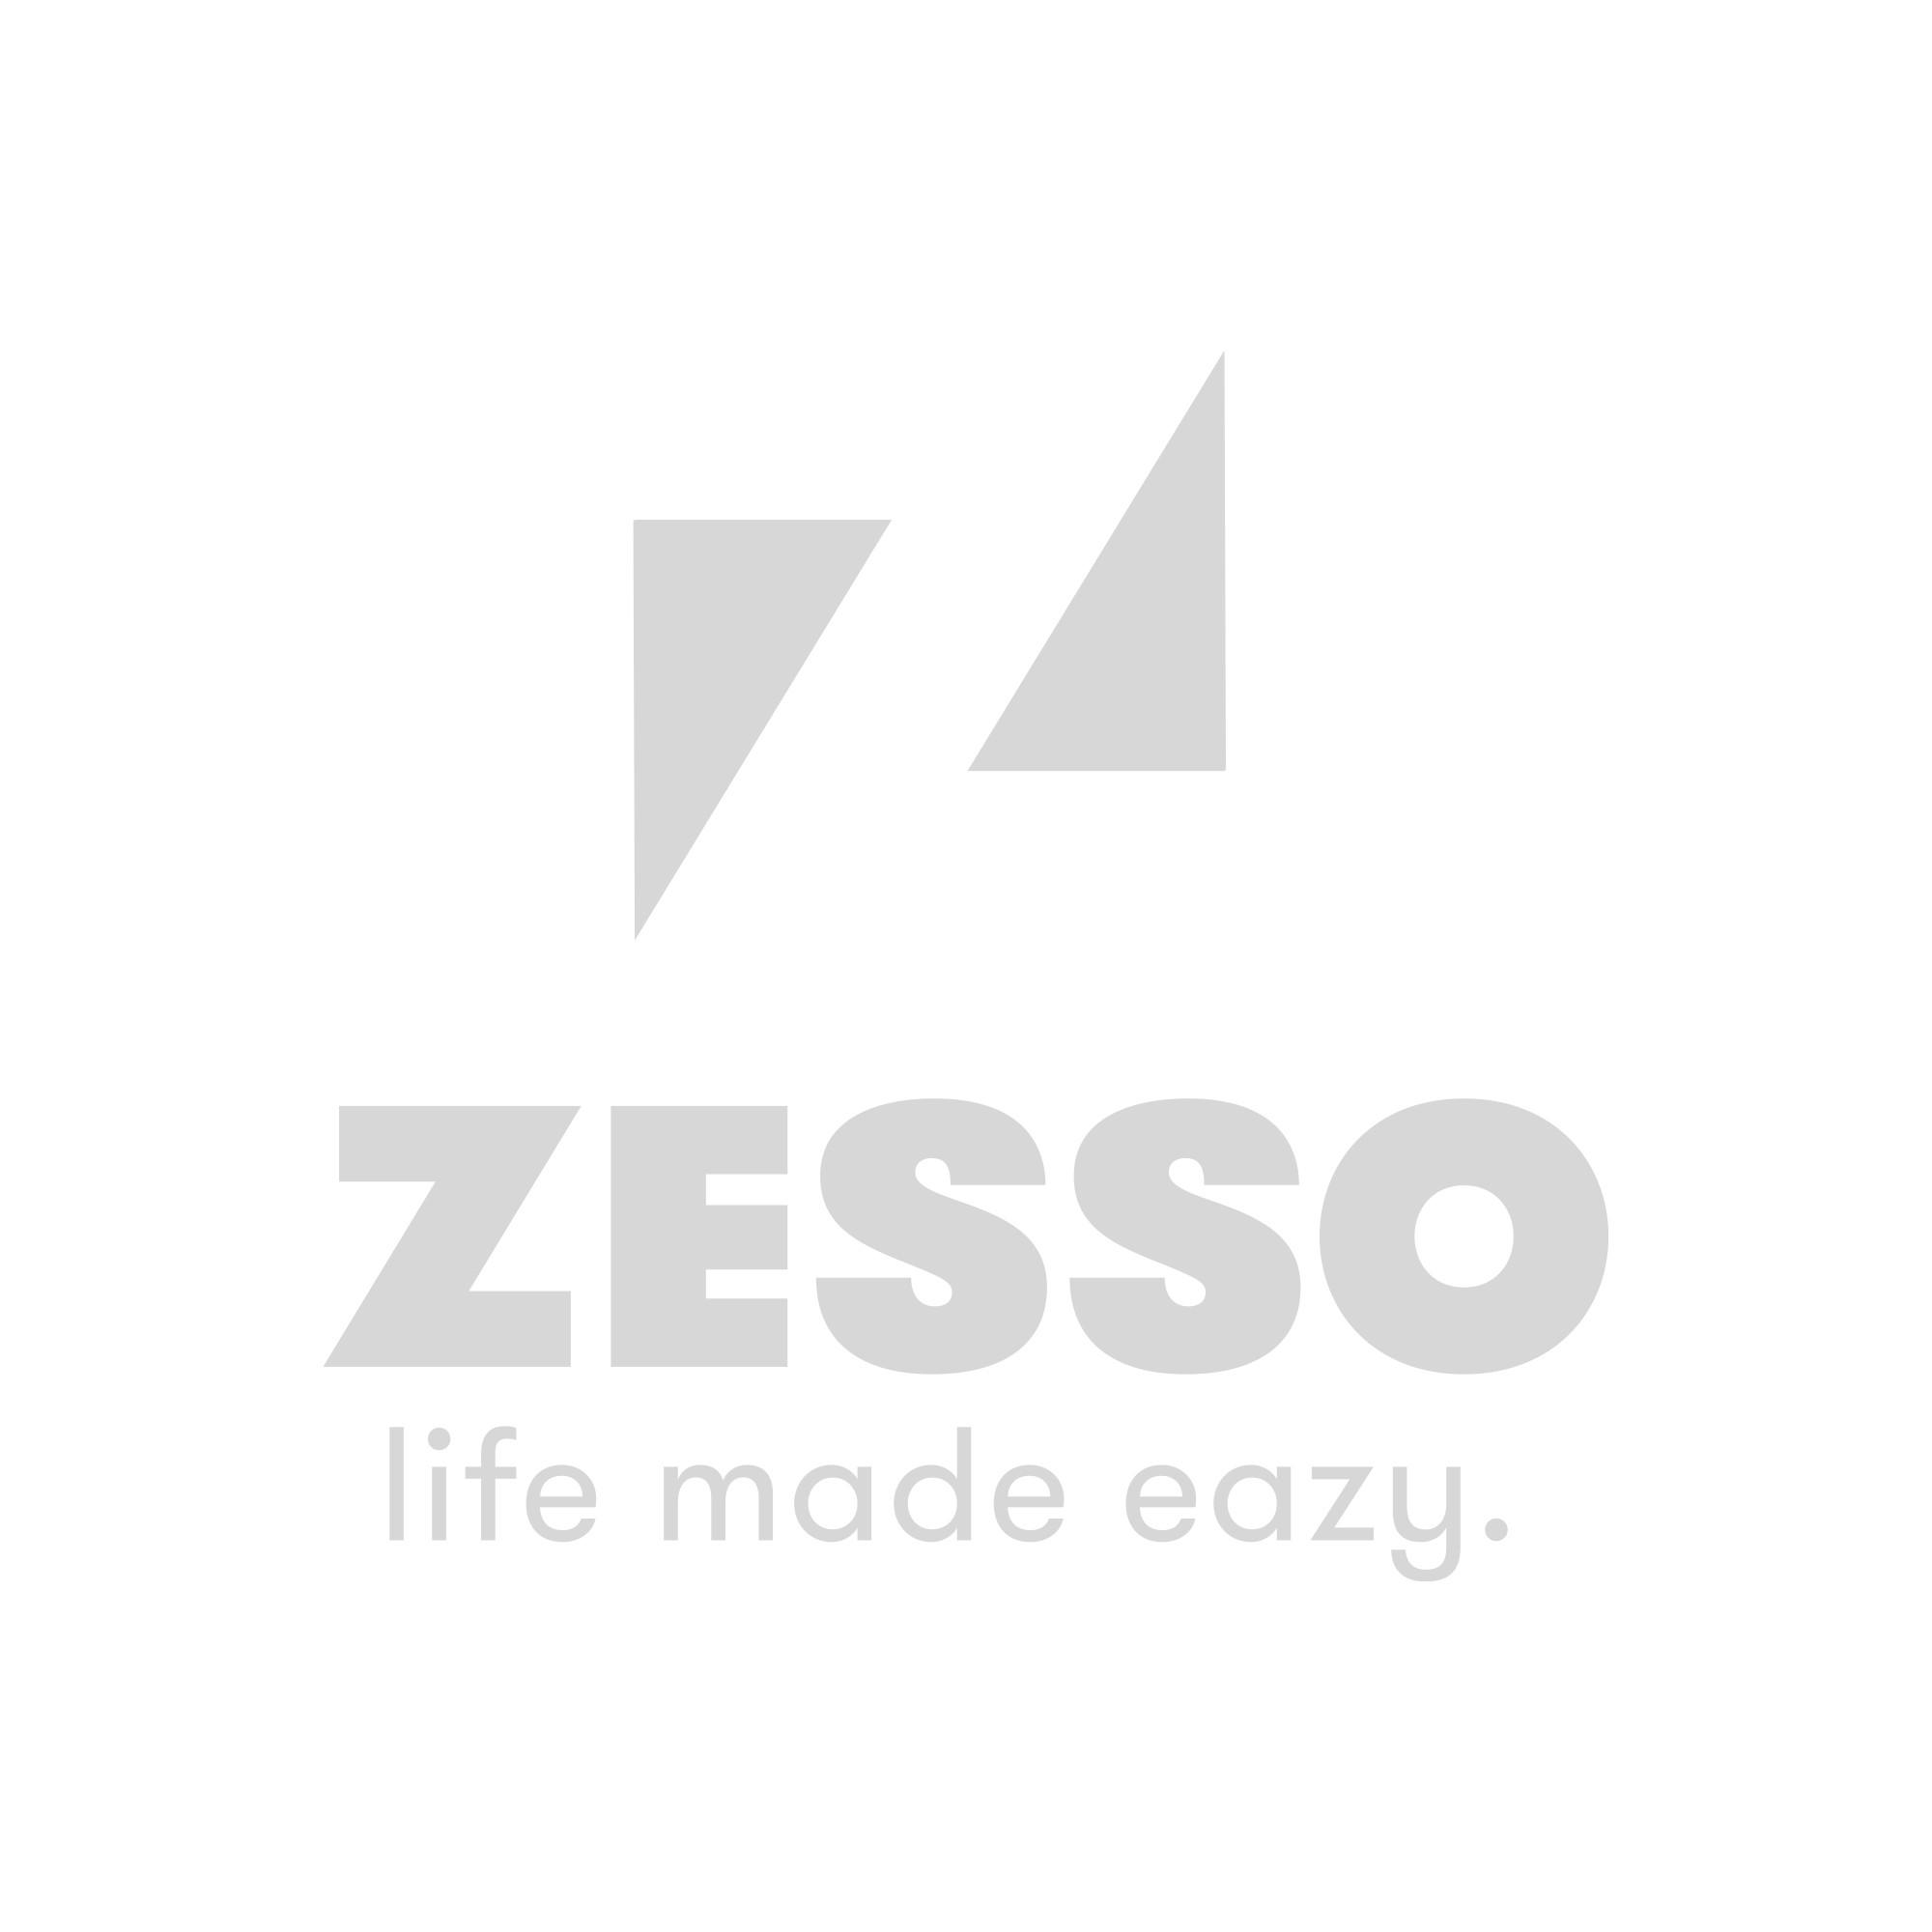 DecoToday Plaid Blaze 125 cm x 150 cm Grey Charcoal